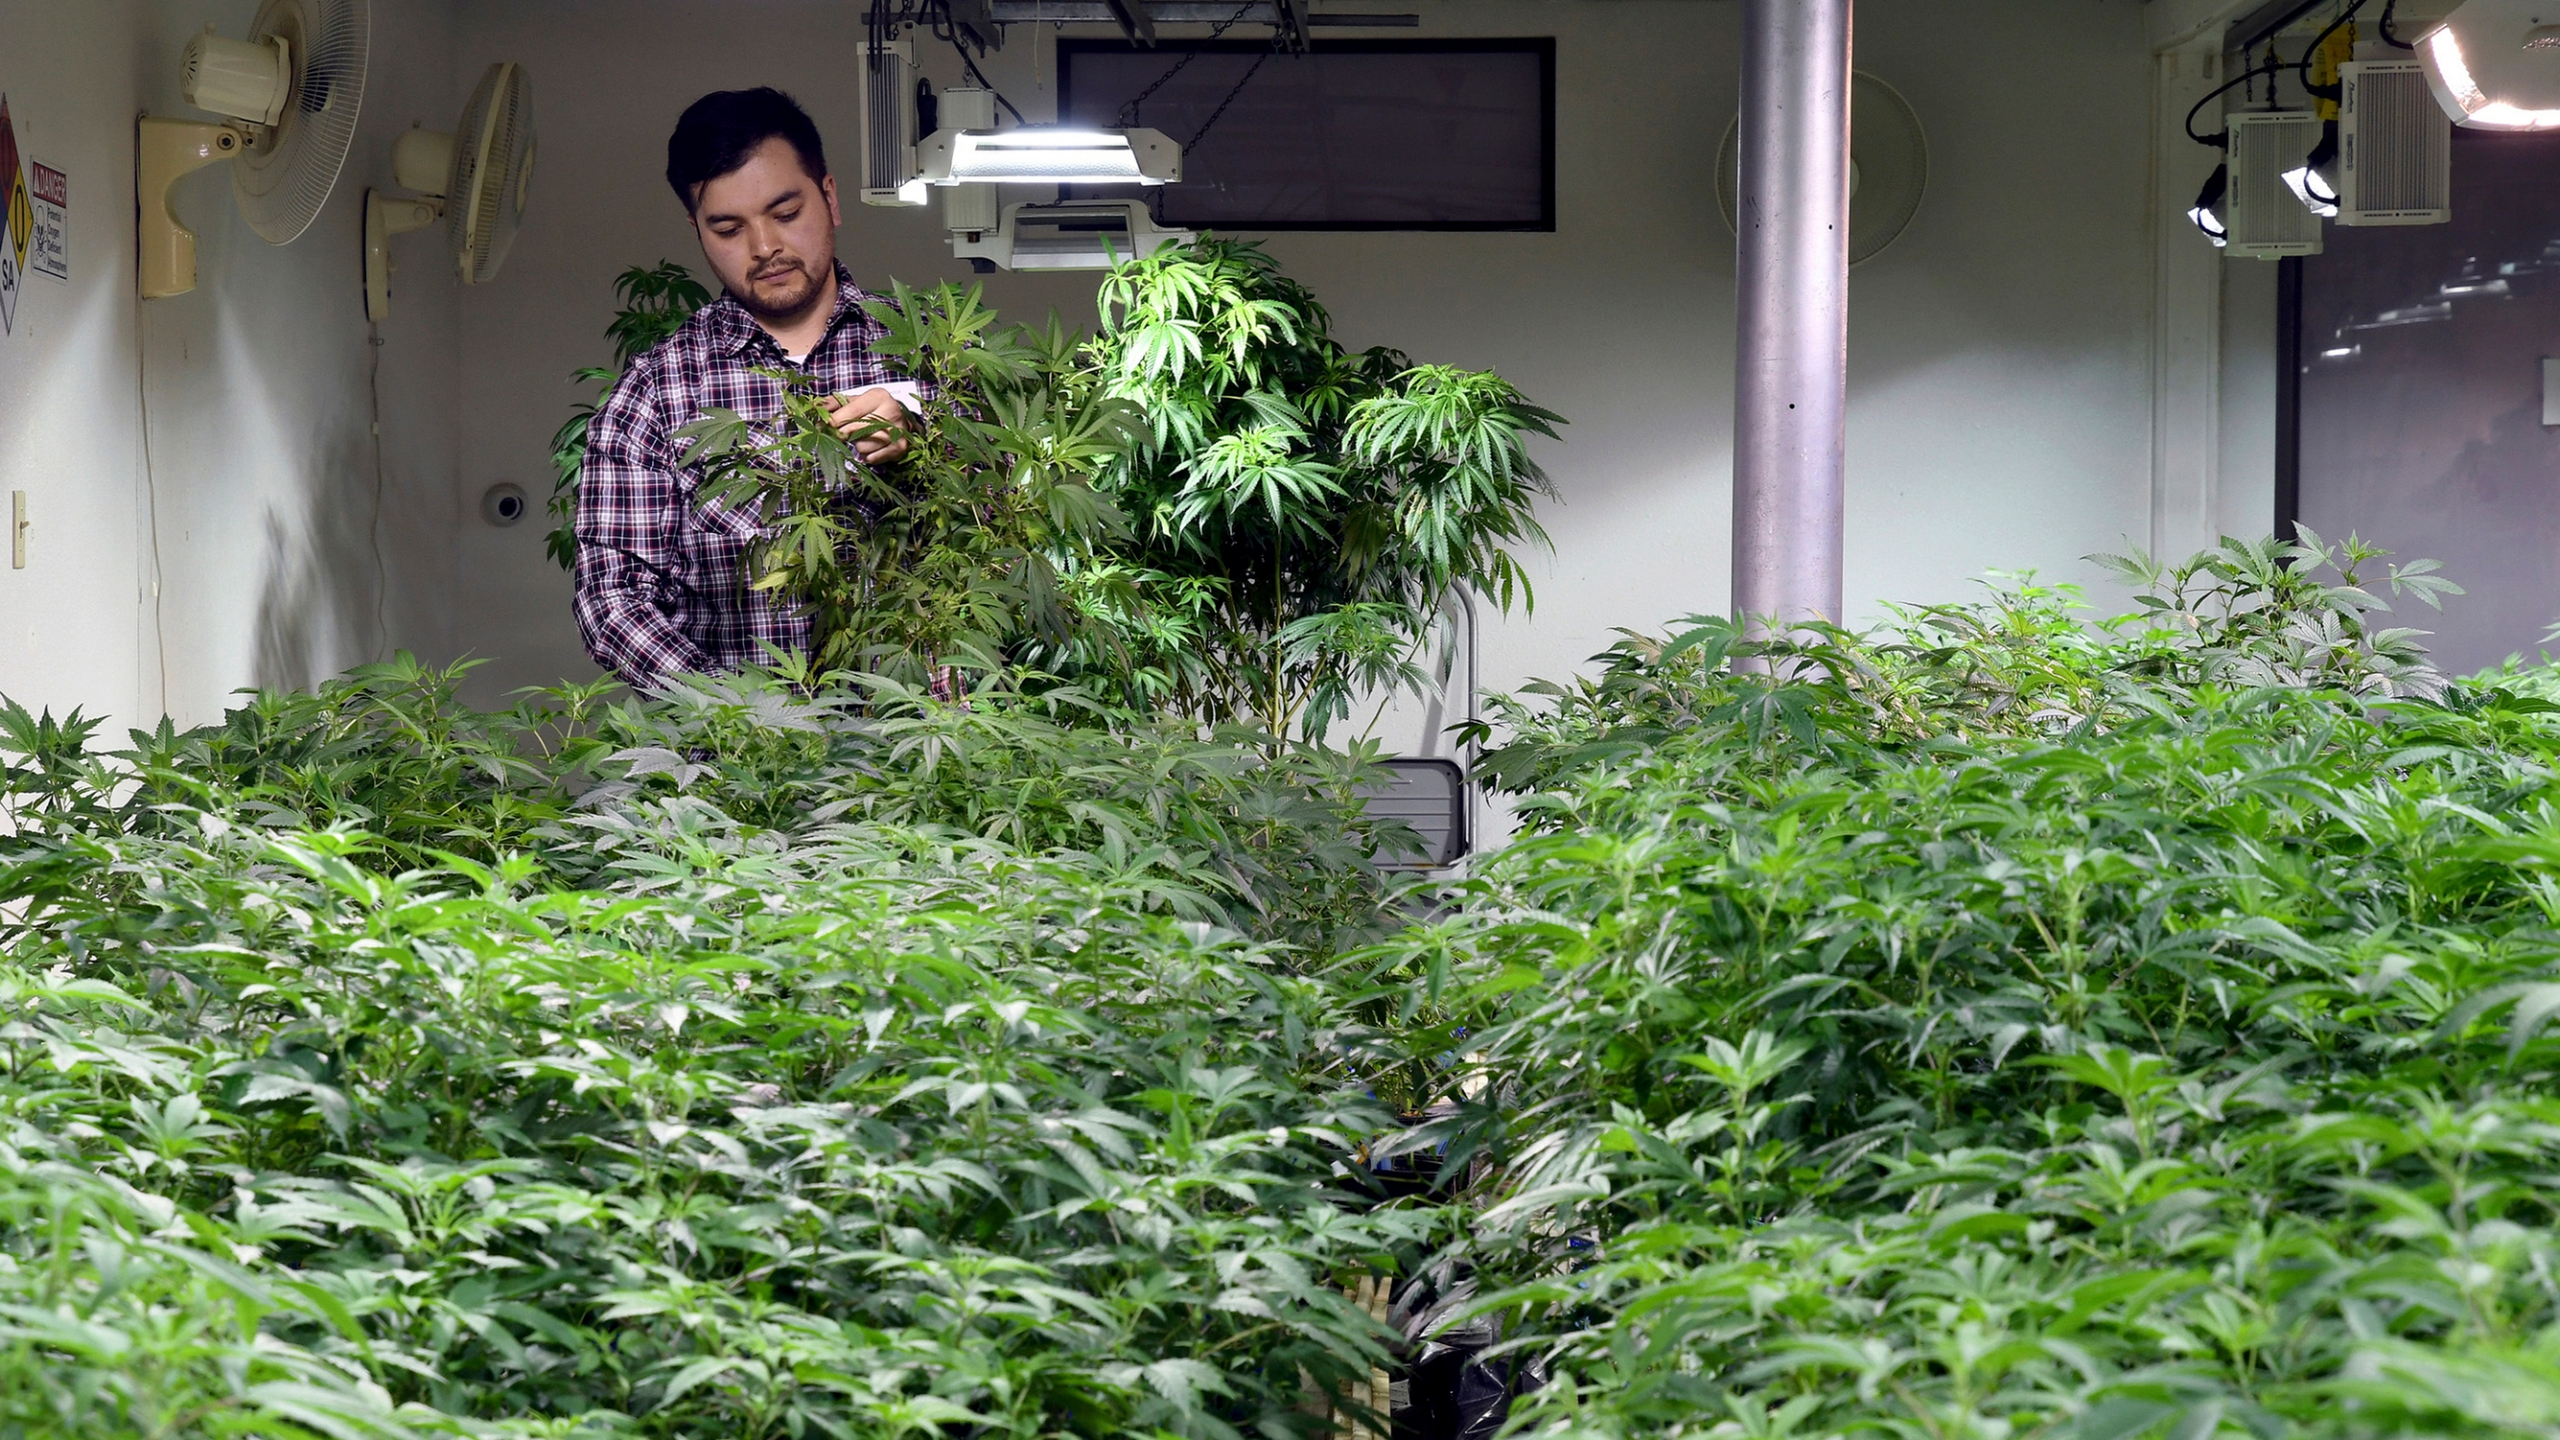 Legal_Marijuana_Citizenship_Denials_59360-159532.jpg98224624